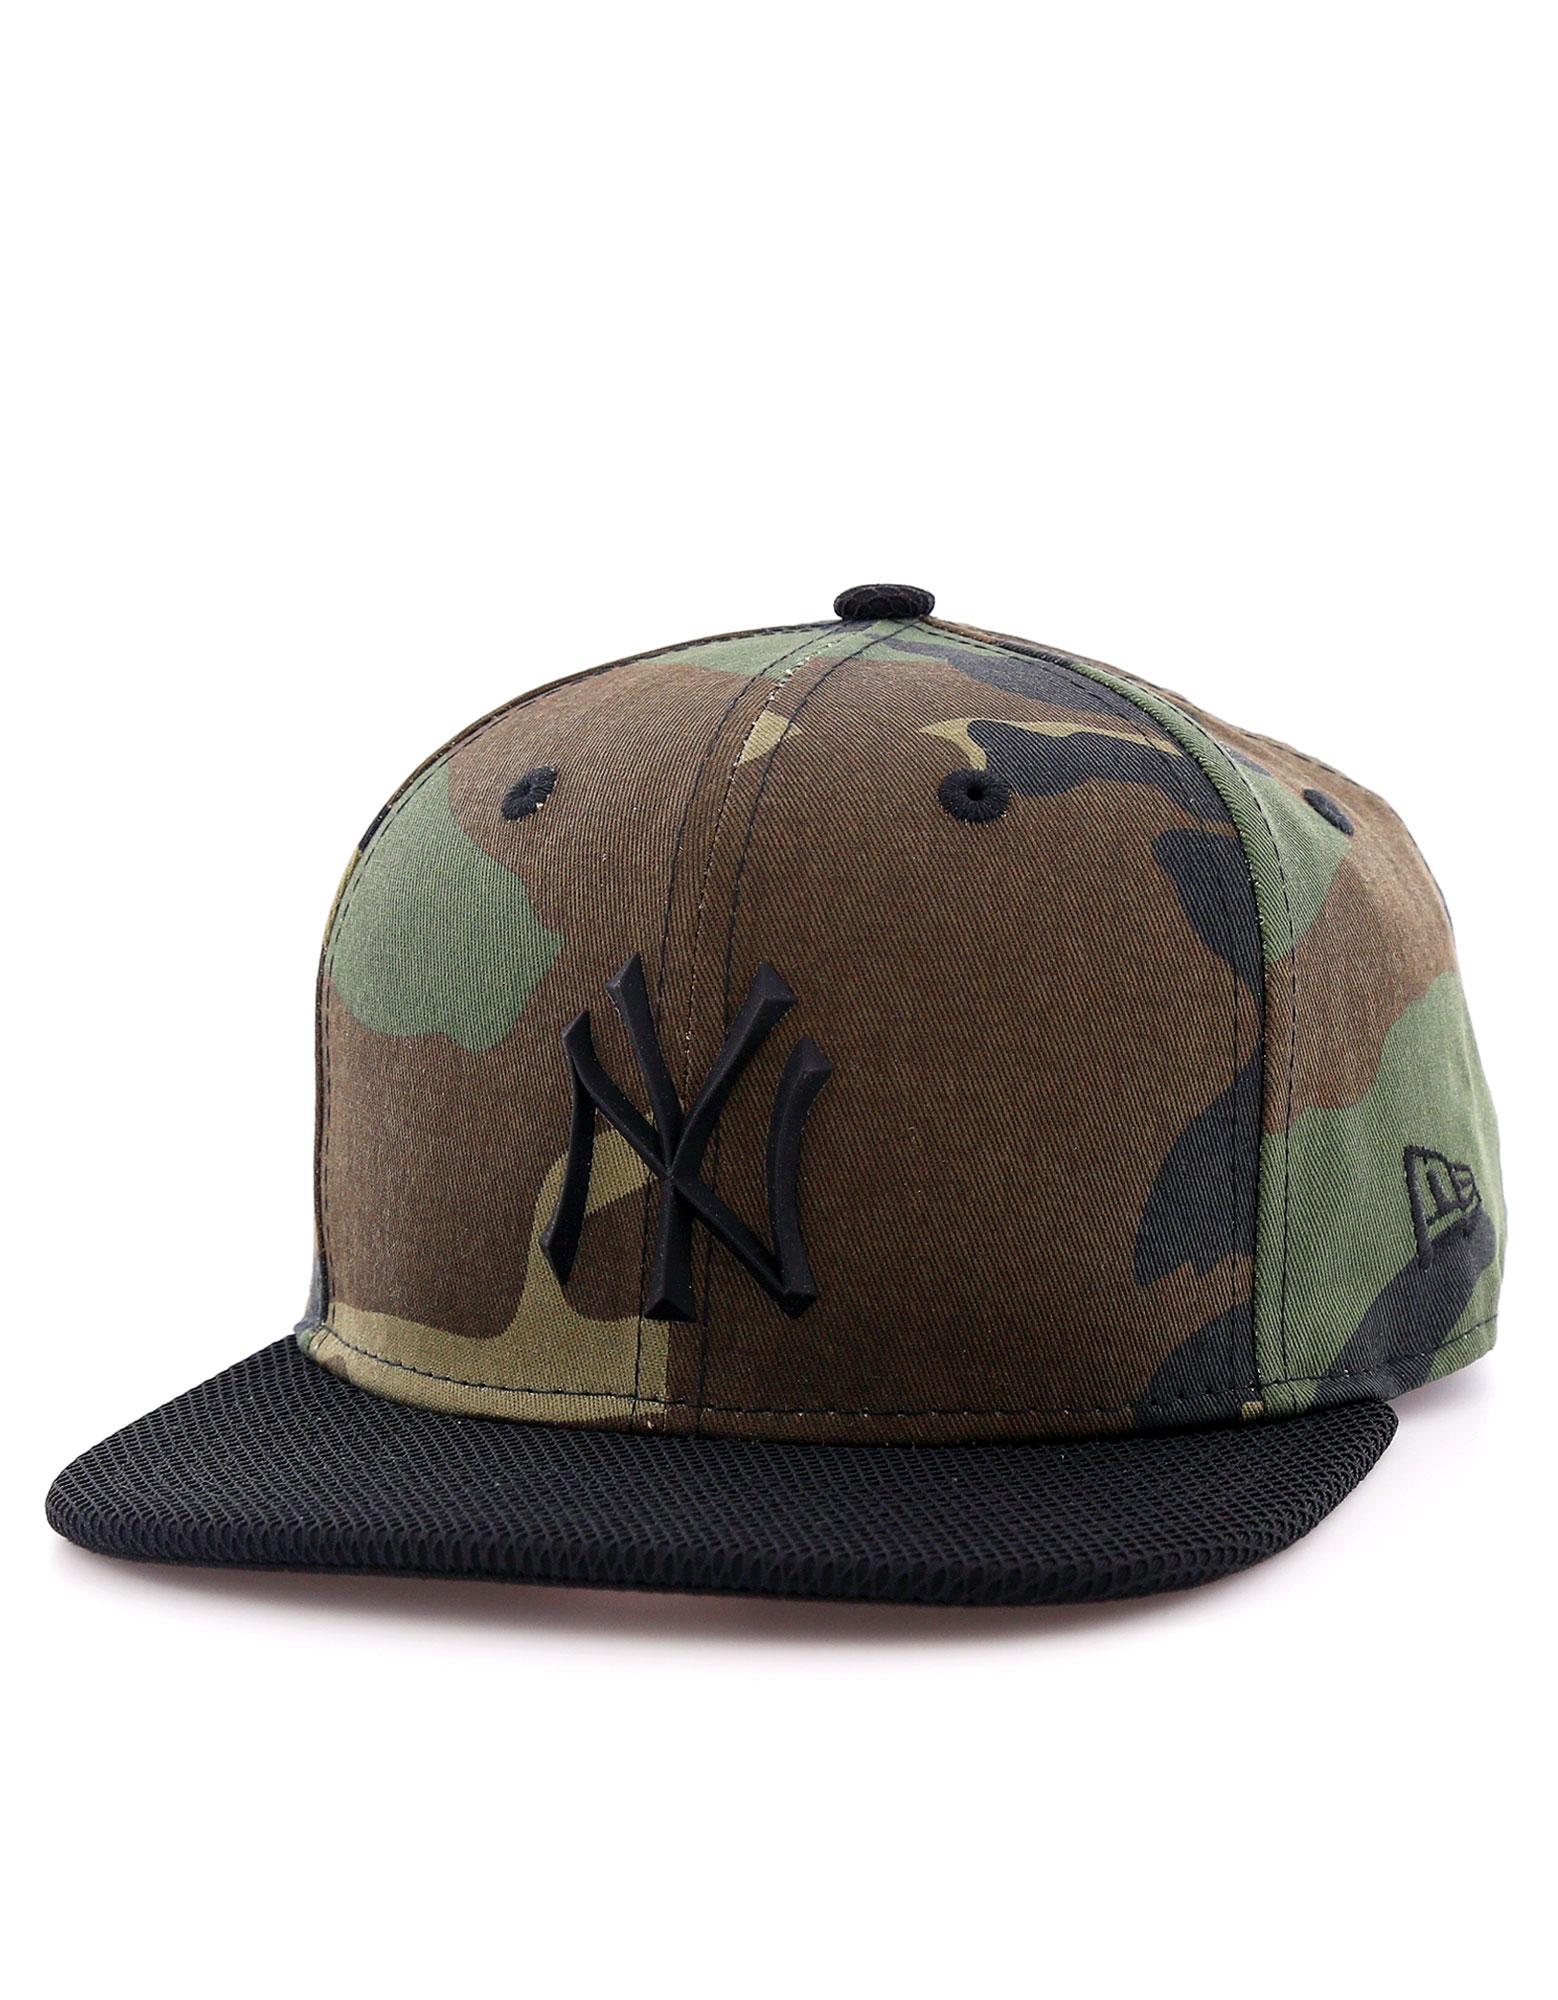 New Era Rubber Prime Ny Yankees Woodland Camo/Black Cap S/M